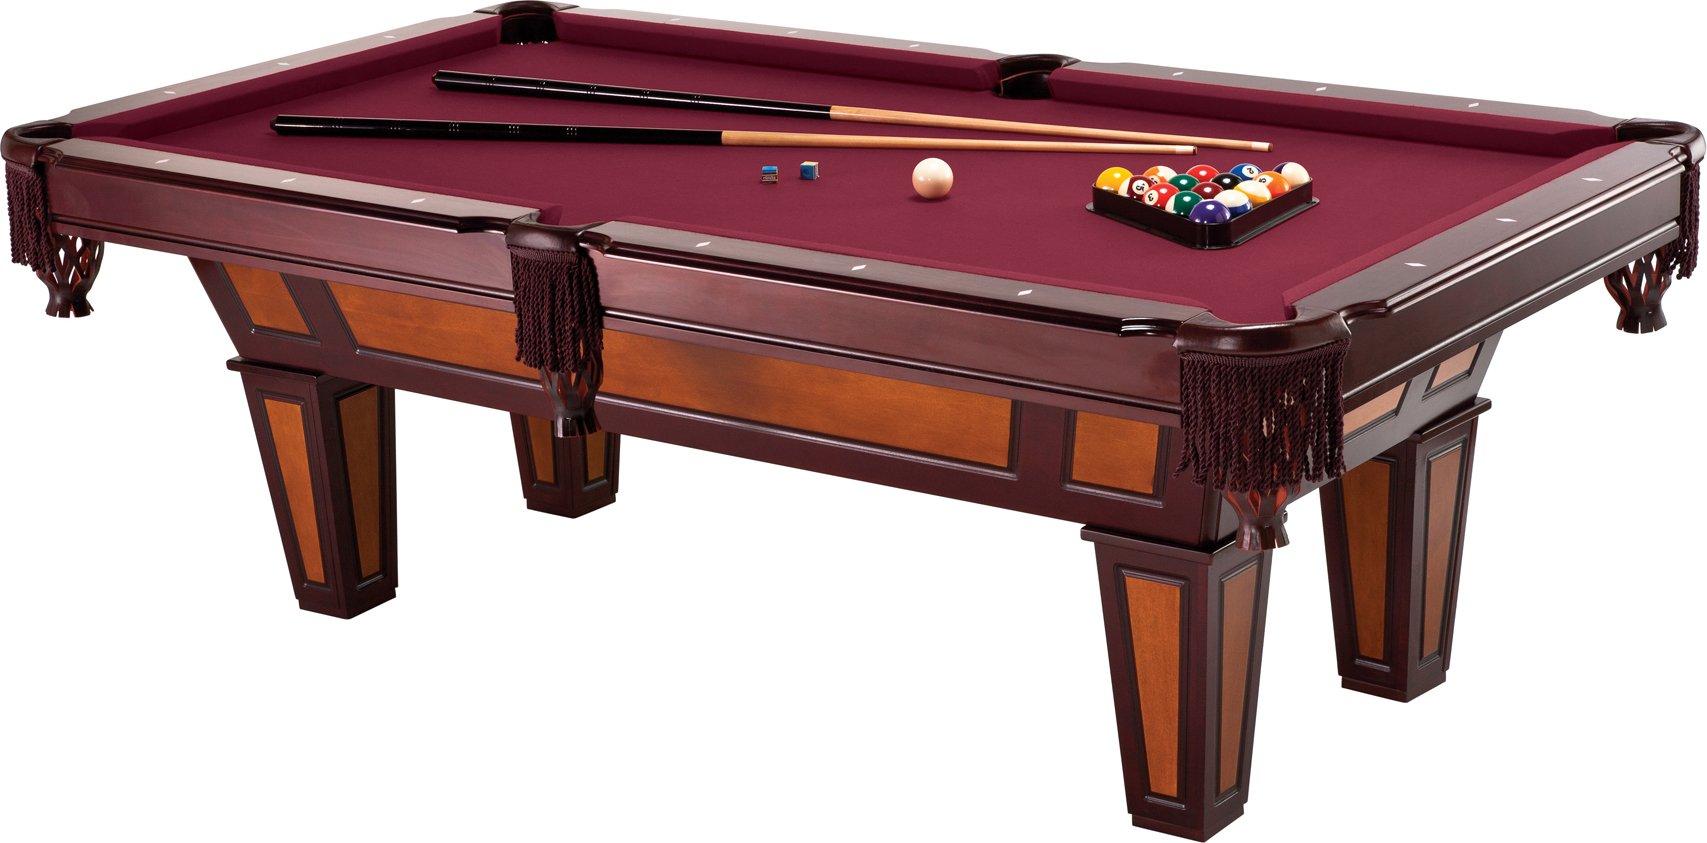 Fat Cat Reno II 7.5-Foot Billiard/Pool Game Table